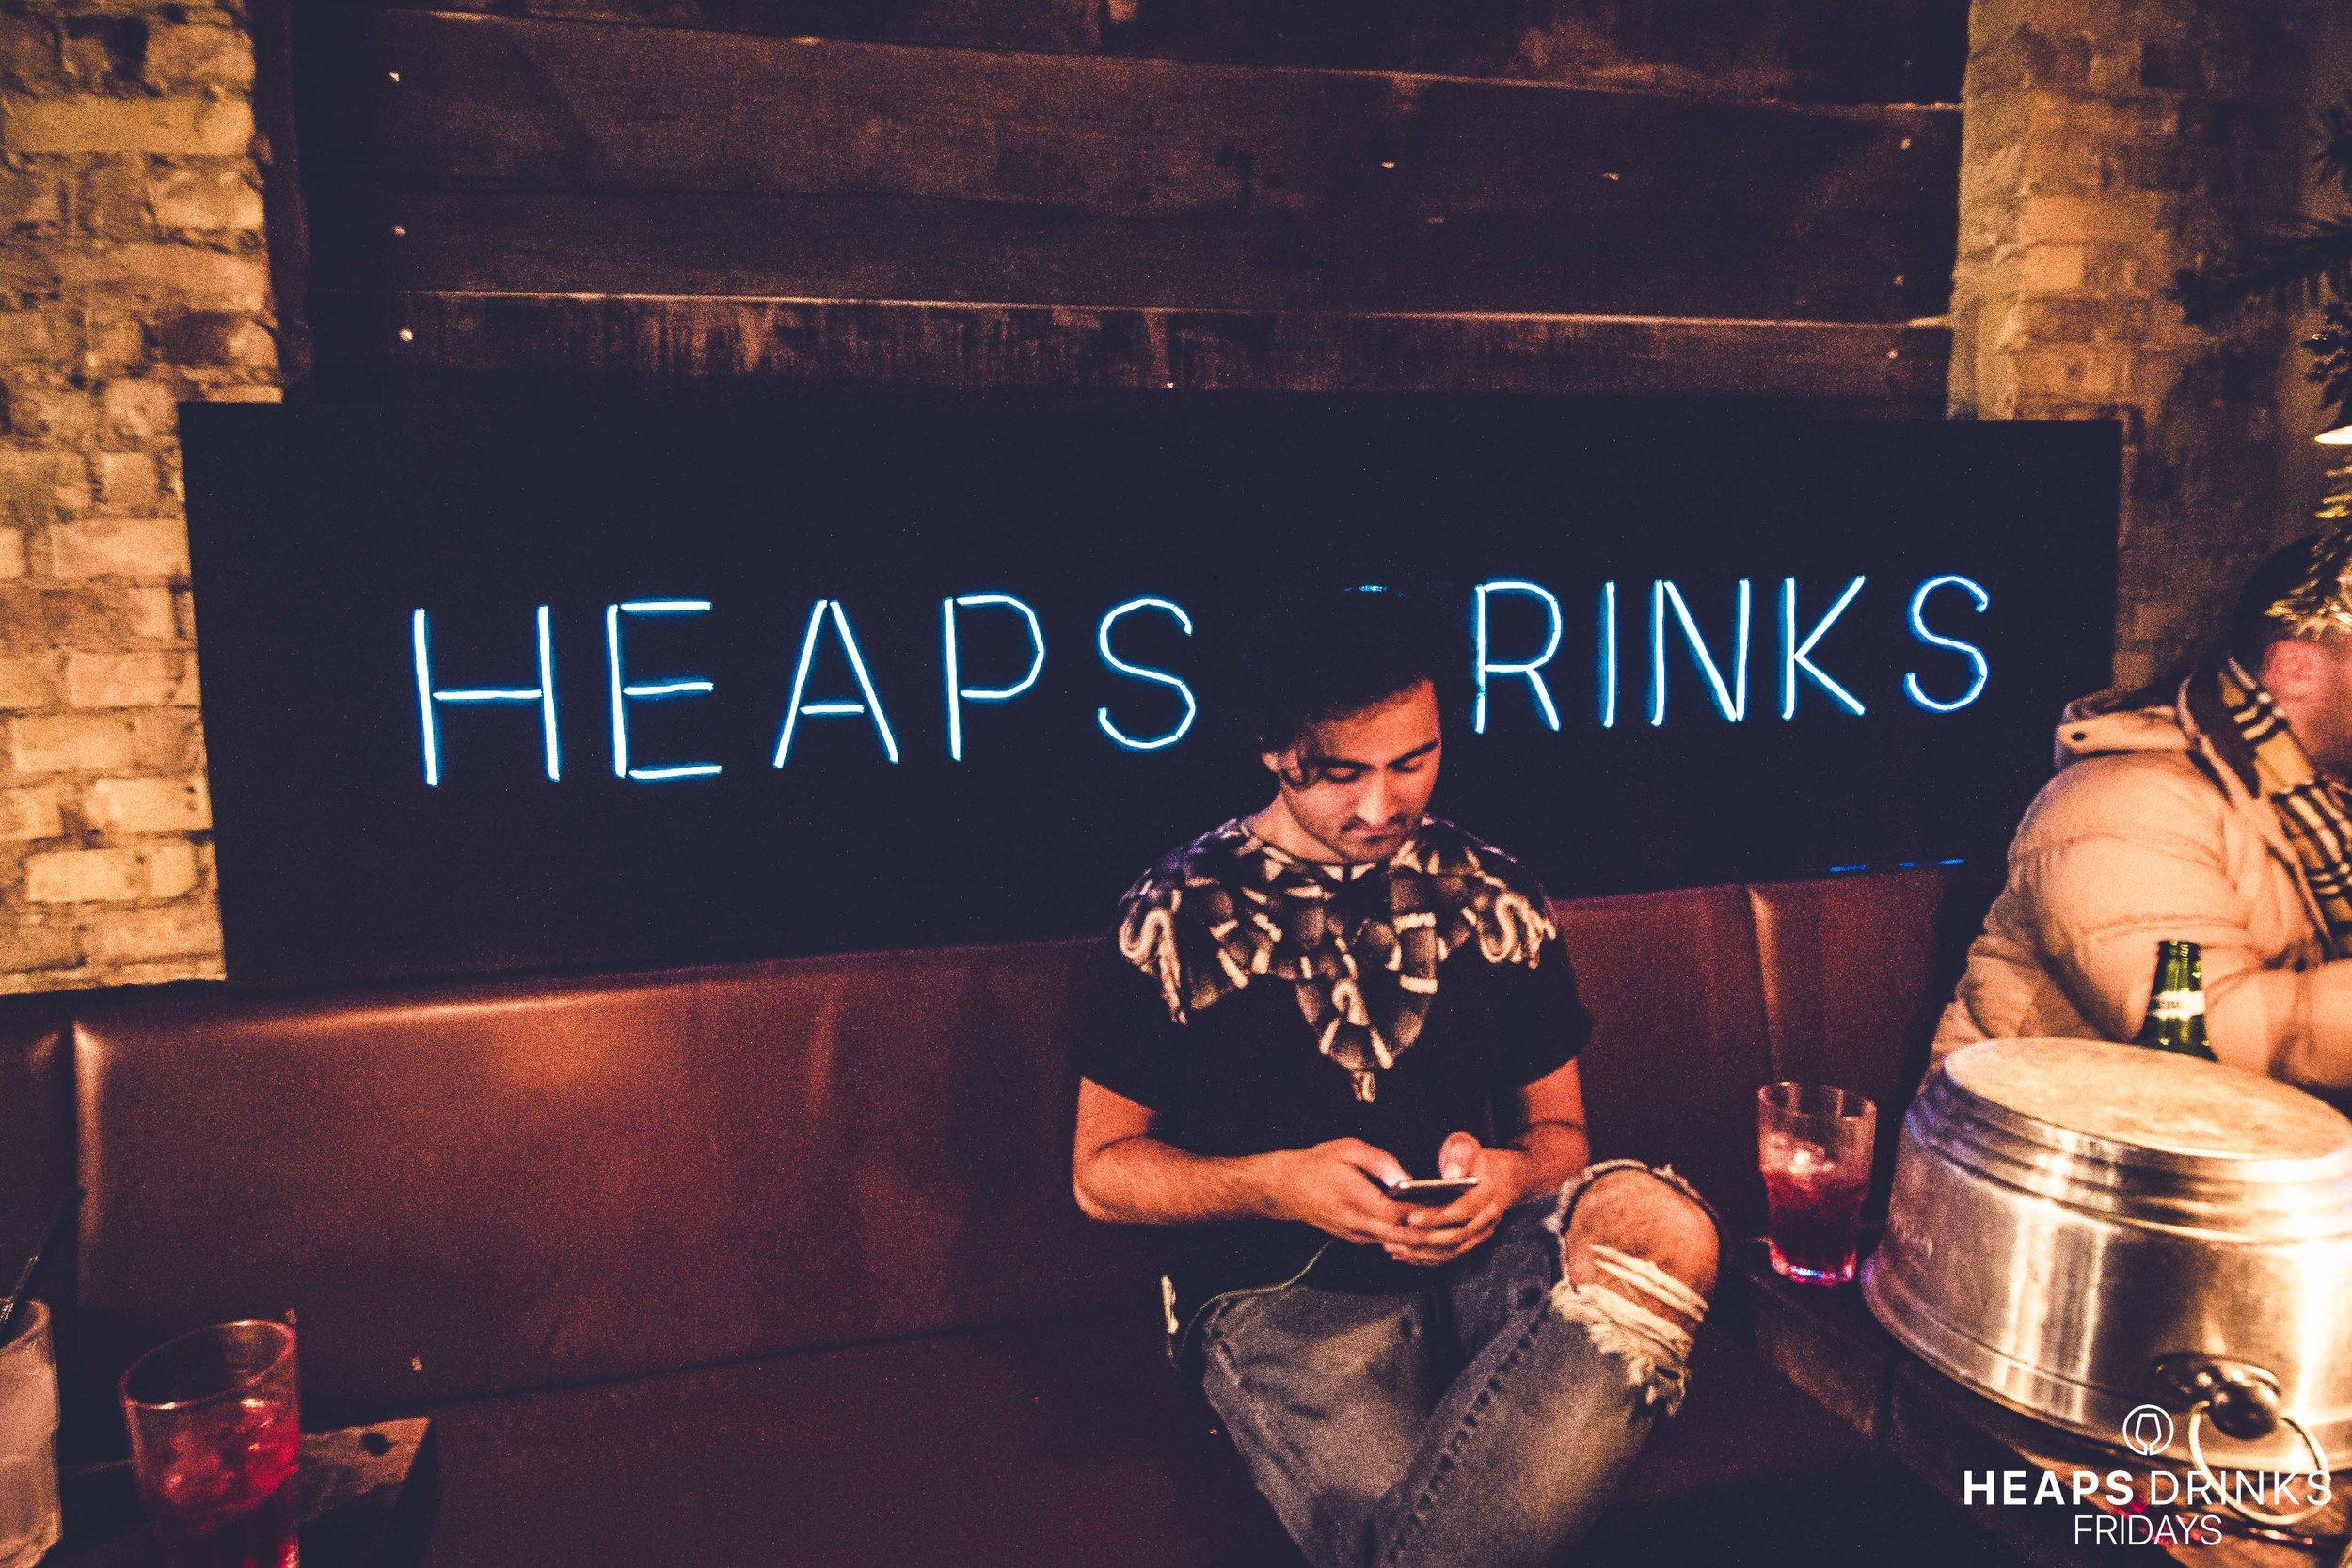 Heaps_drinks_41.jpg